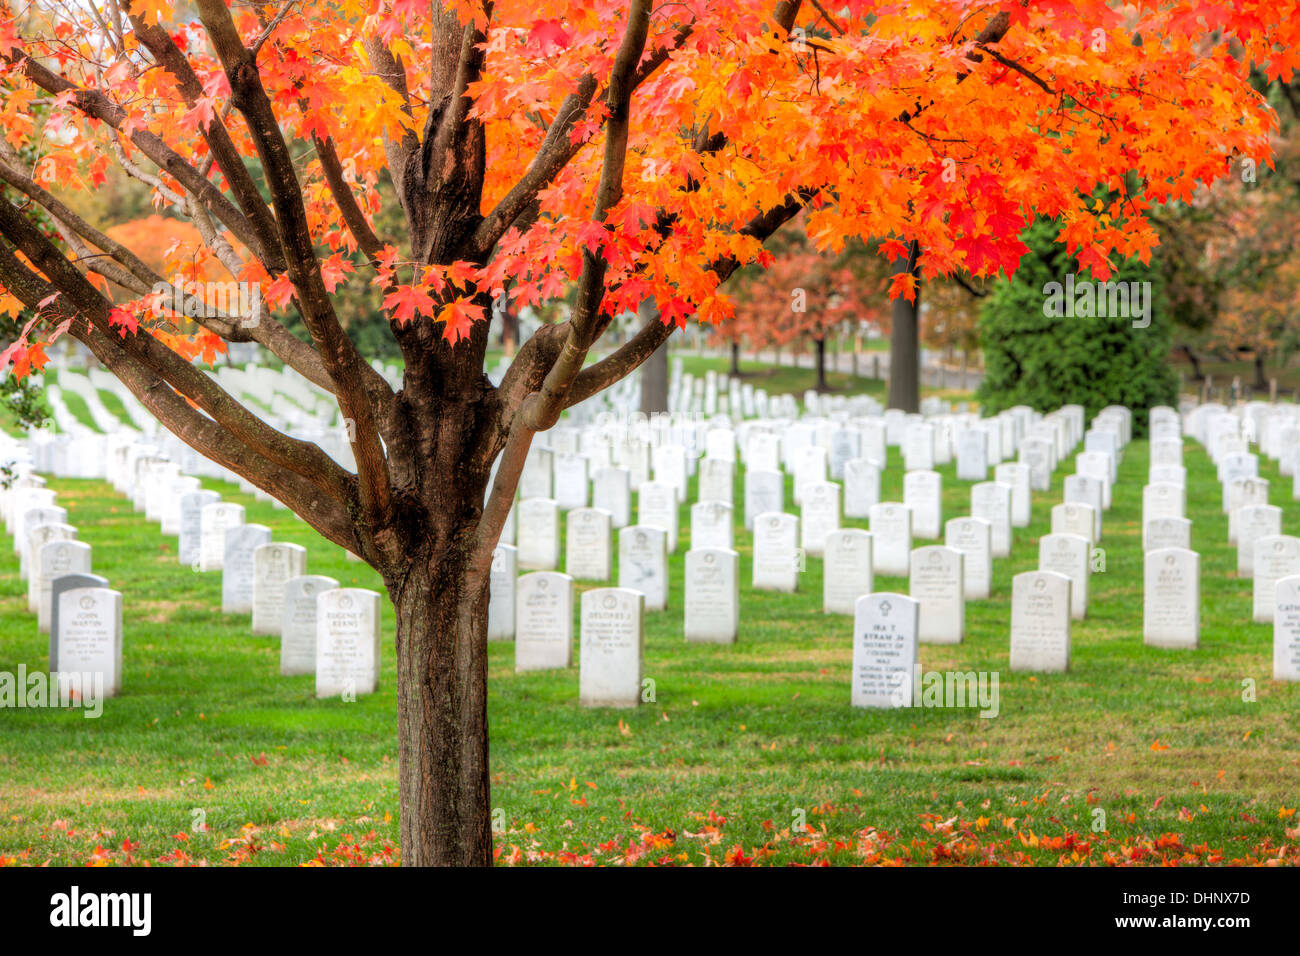 Arlington National Cemetery Stock Photos & Arlington National ...